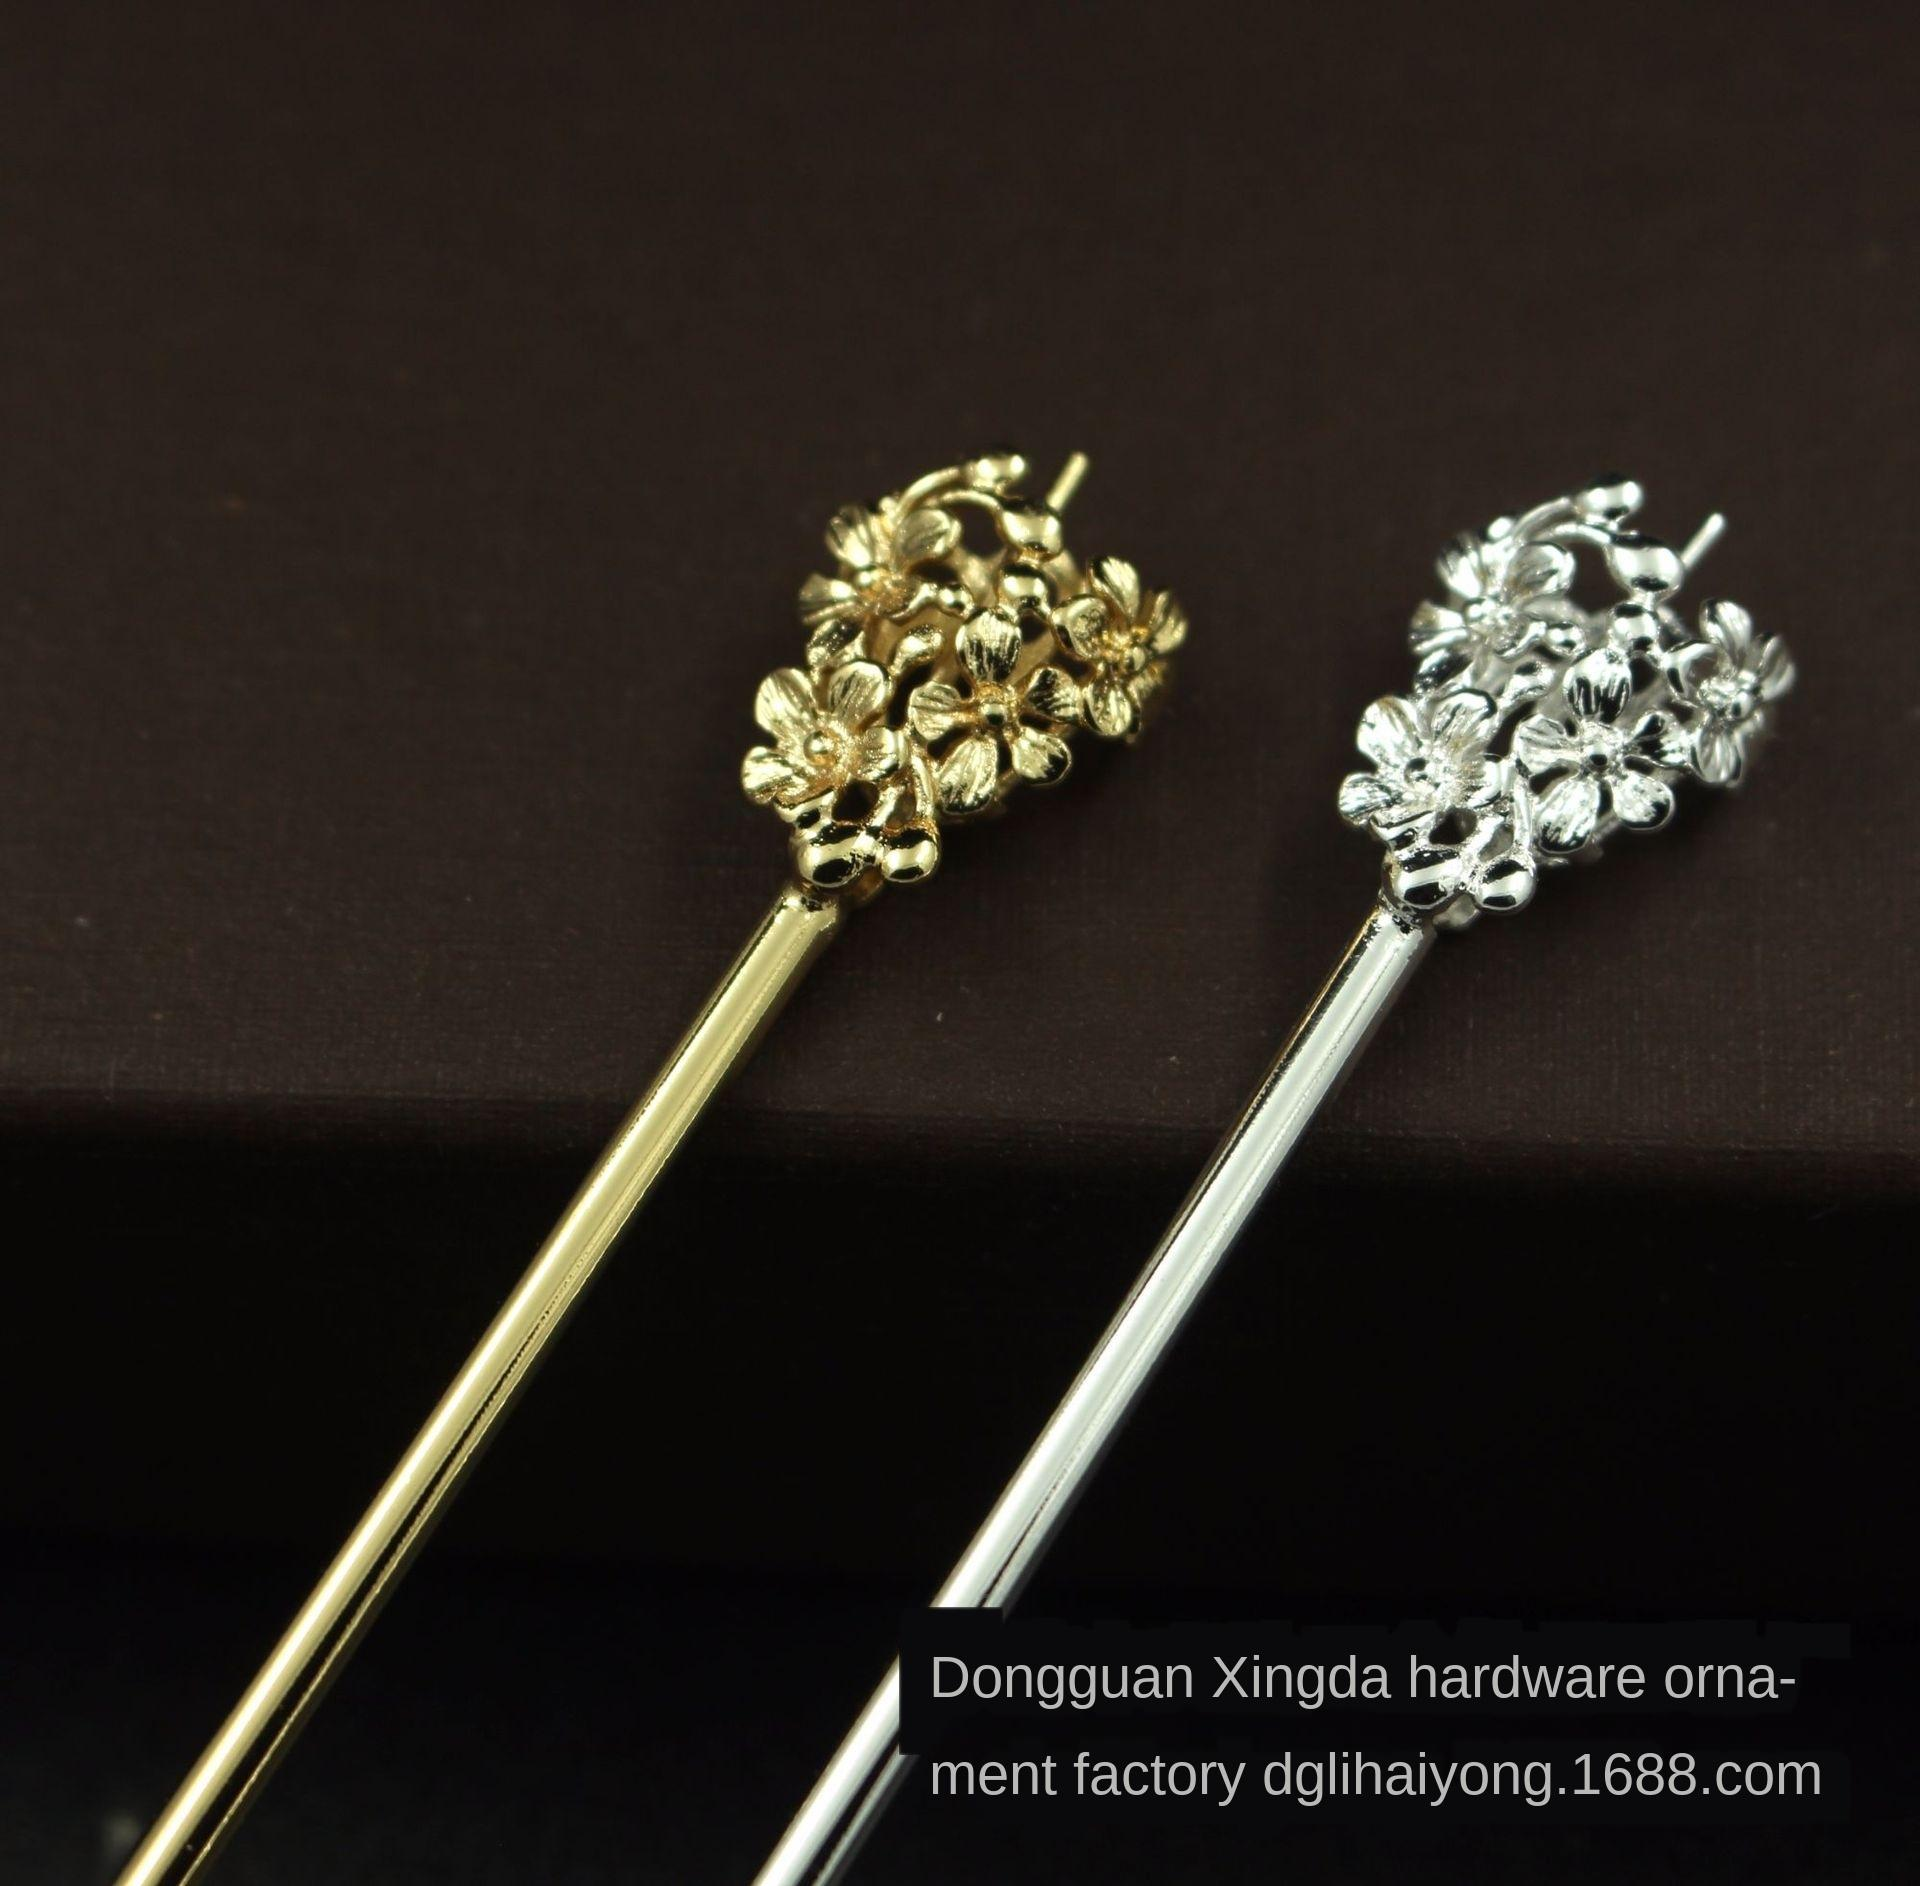 Cor-preservando ouro soldagem e hairpin integrado Rod vídeo antigo cor-preservando ouro soldagem Acessórios e adereços hai integrado